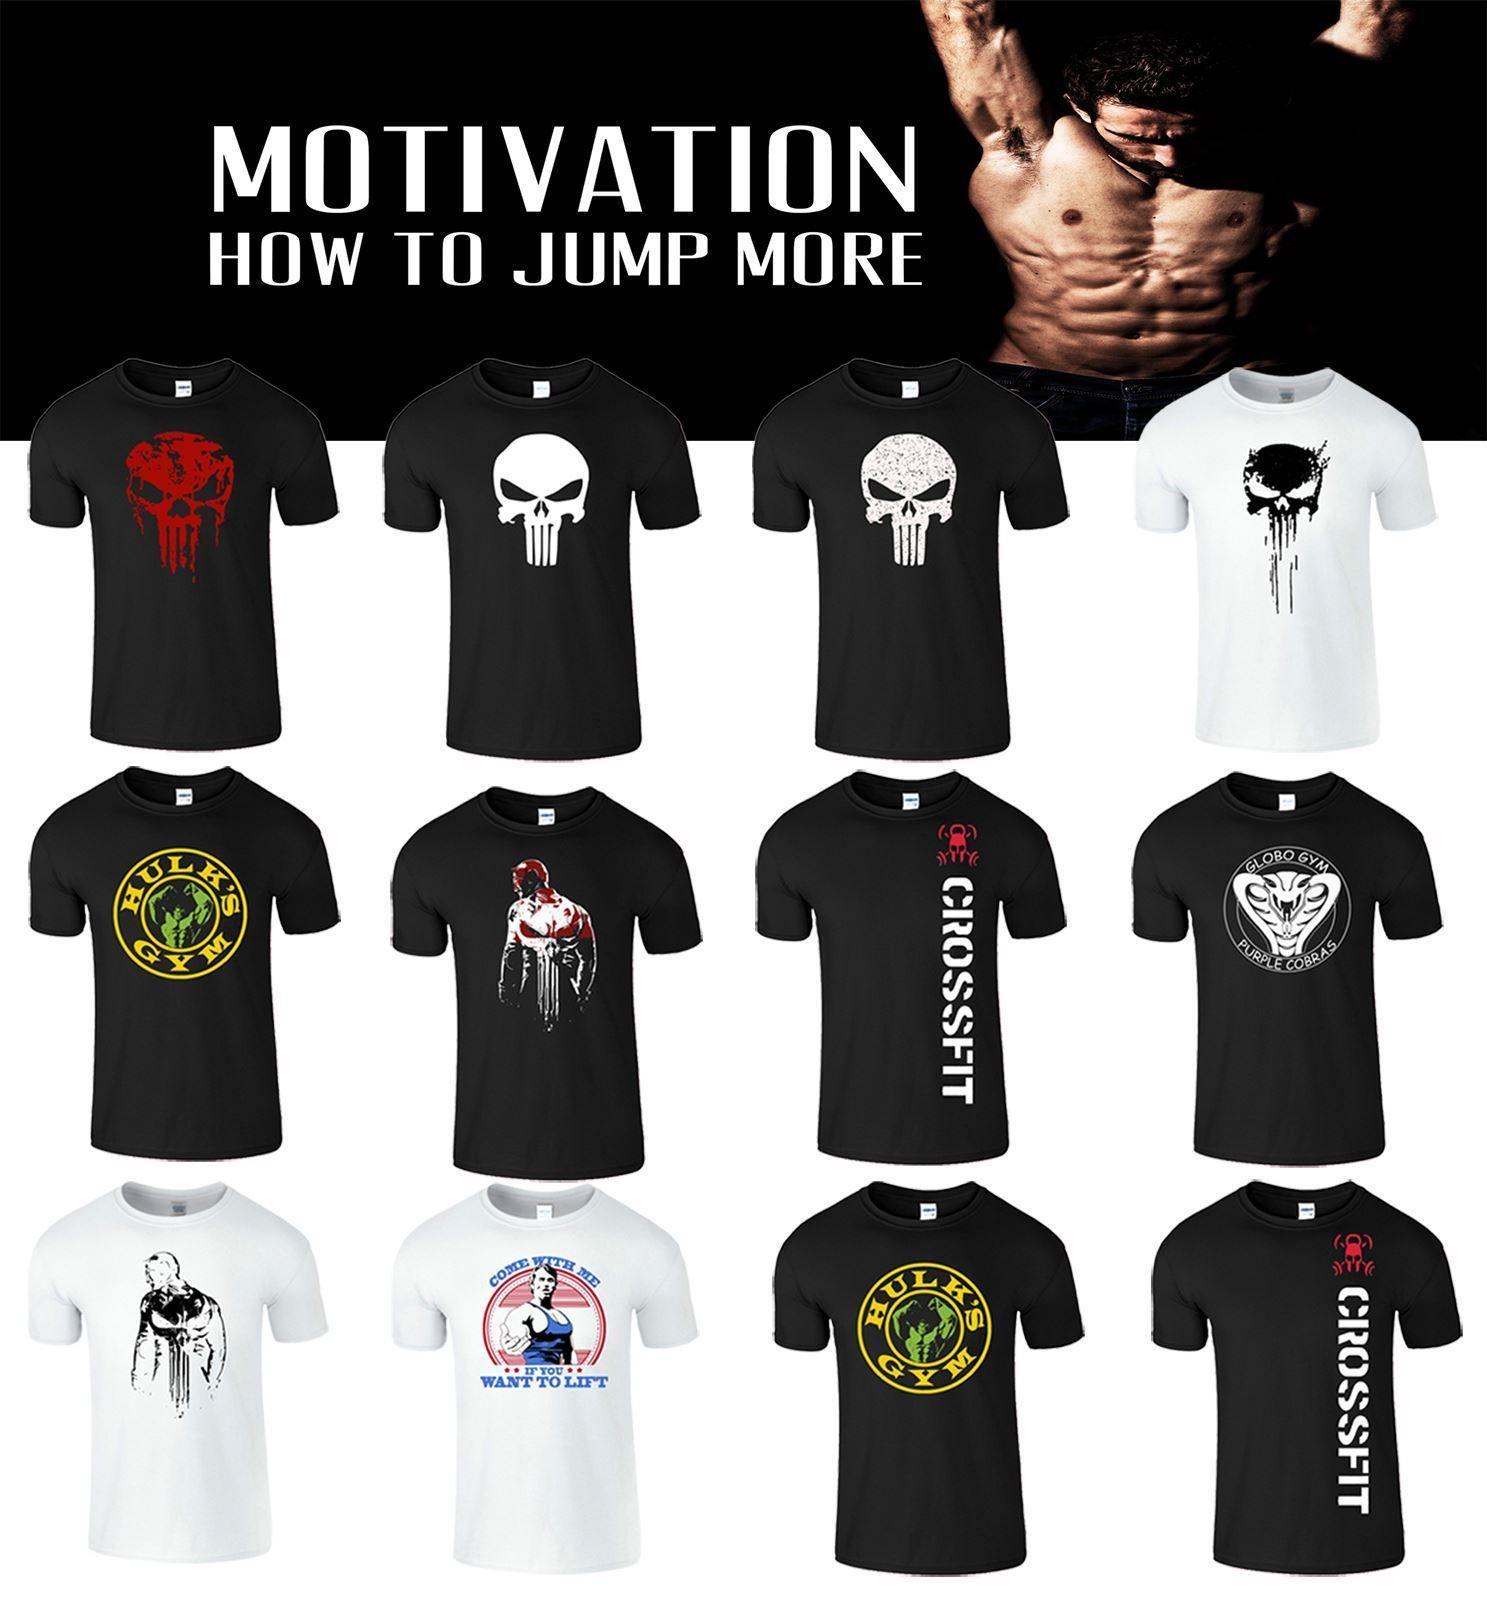 2db4d352c Arnold Punisher Mens T Shirt Skull Motivation UK Bodybuilding Workout  Training Cool Casual Pride T Shirt Cotton Shirt Tee Shirts Online From  Designtshirts, ...